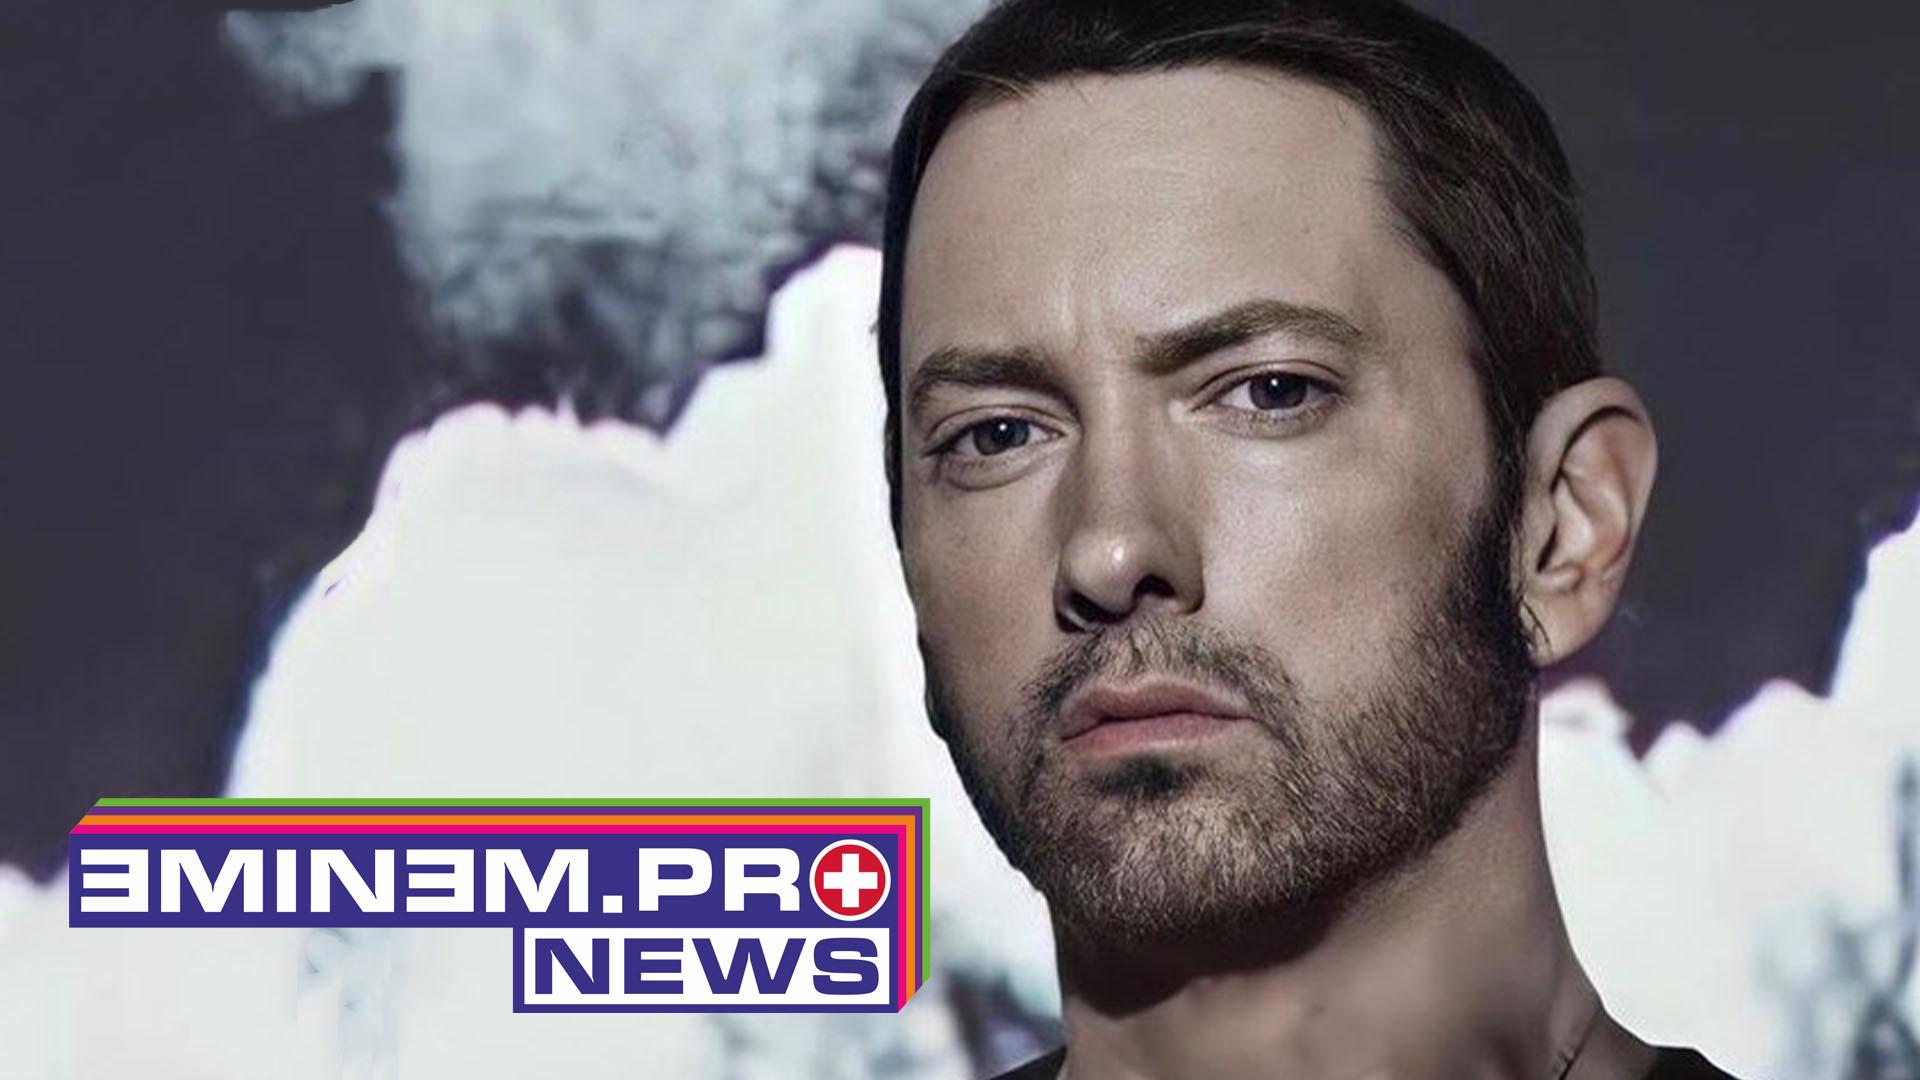 Friends And Celebrities Wish Eminem Happy Birthday